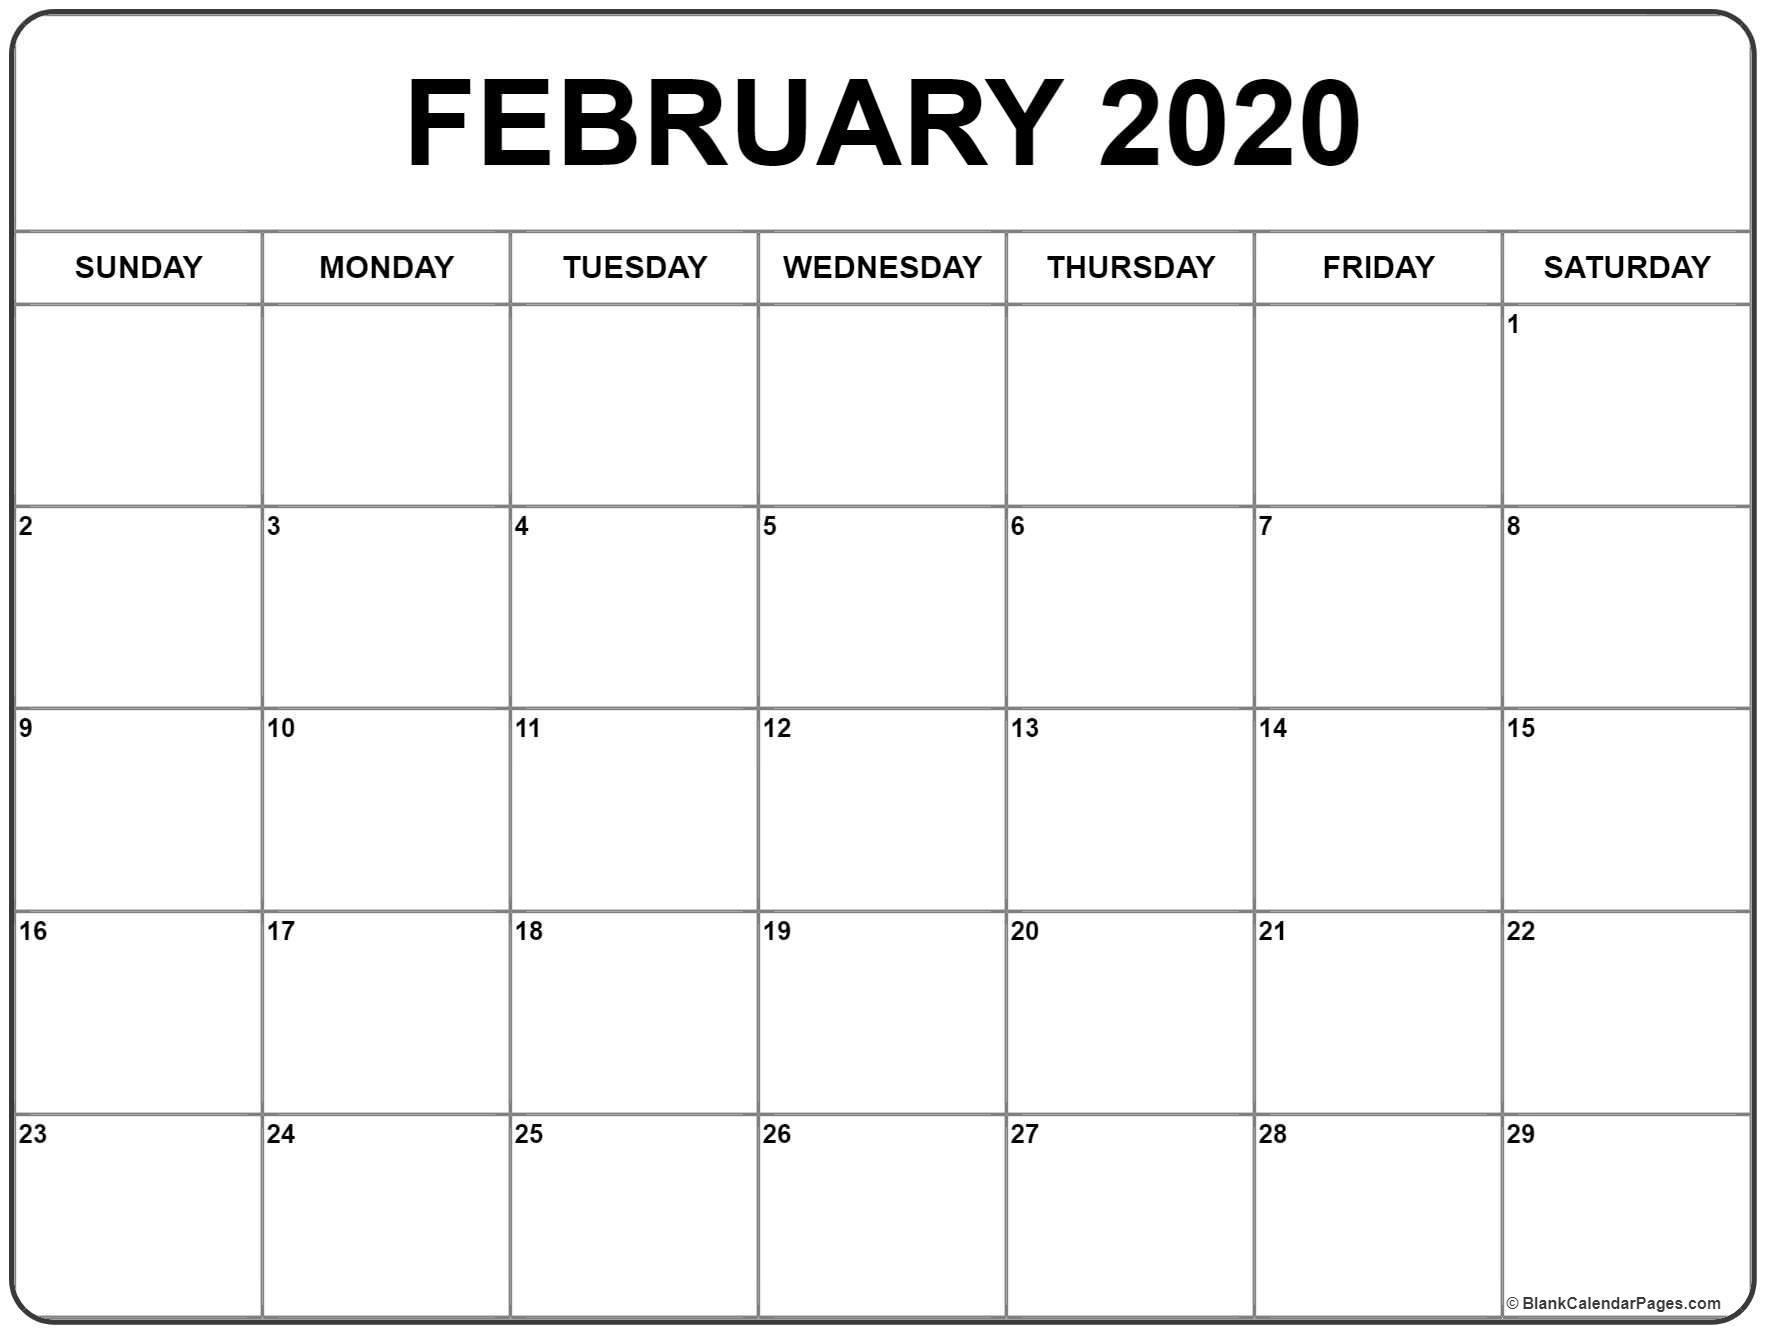 February 2020 Calendar 56 Templates Of 2020 Printable Calendars